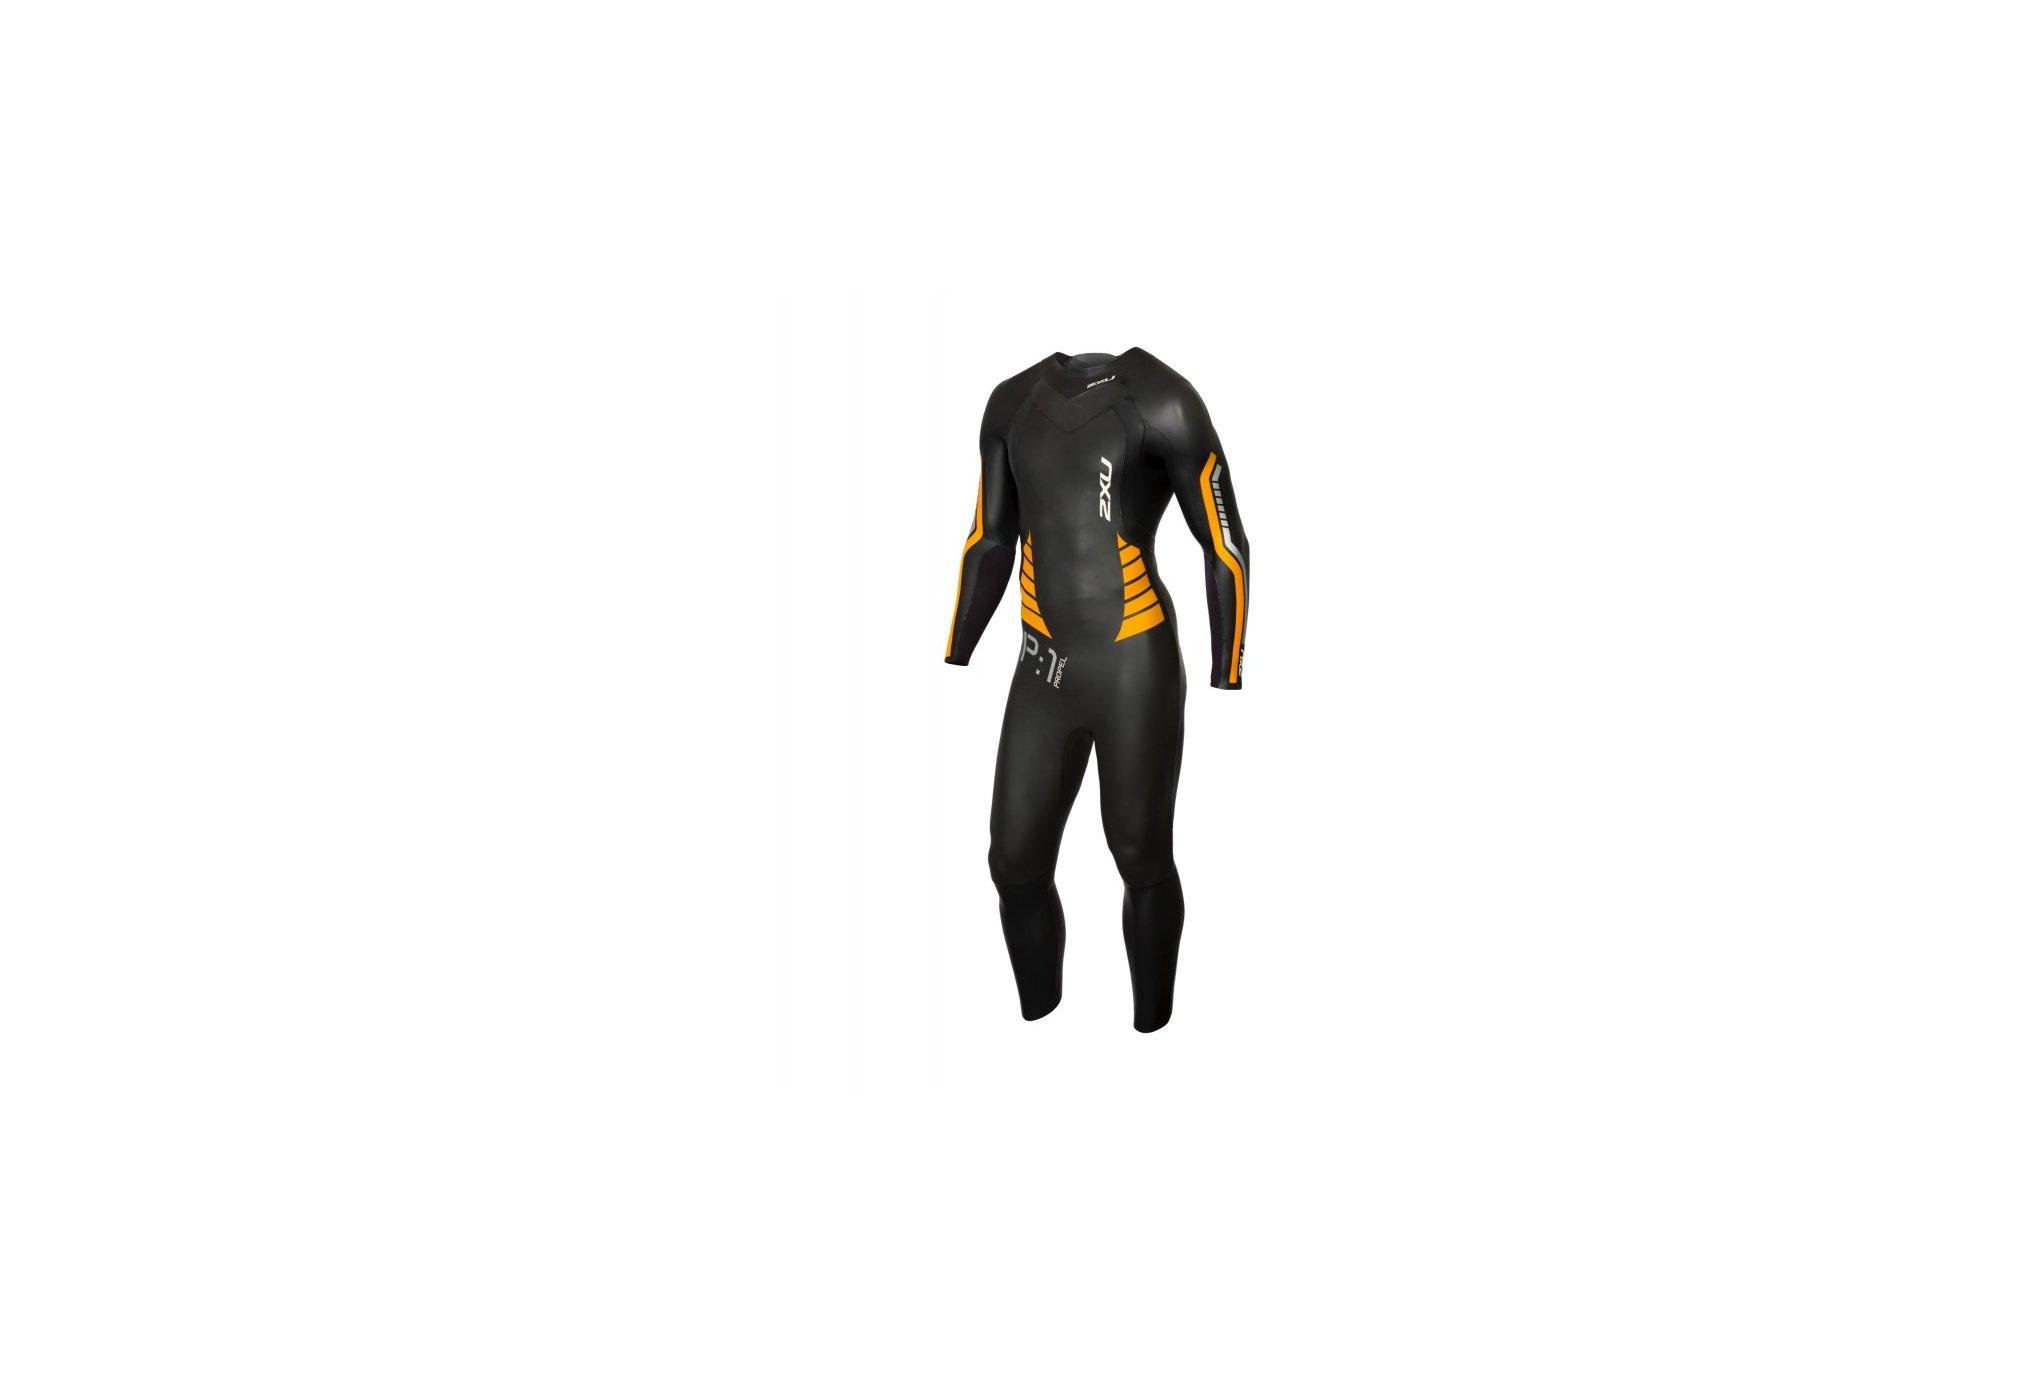 2xu Combinaison p:1 propel wetsuit m vêtement running homme